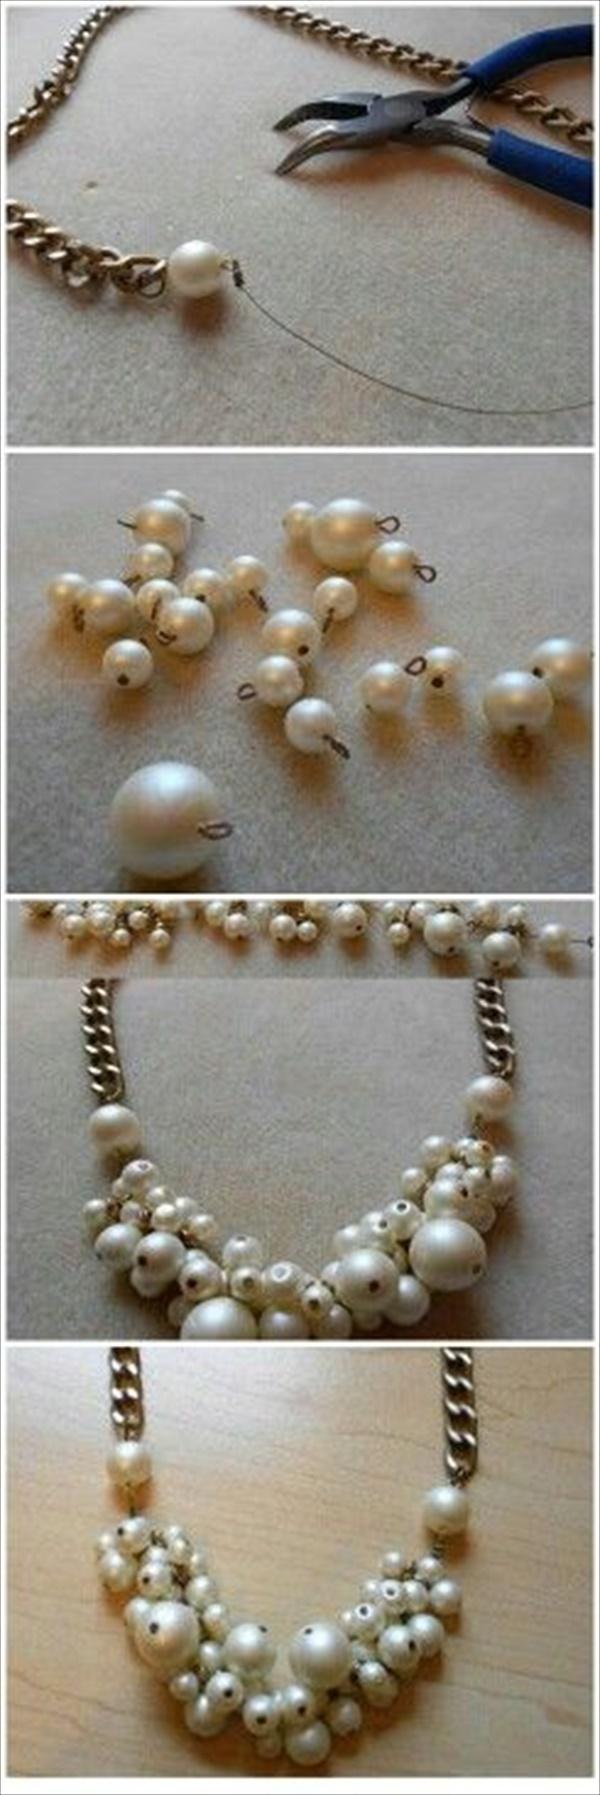 DIY Cute necklace ideas